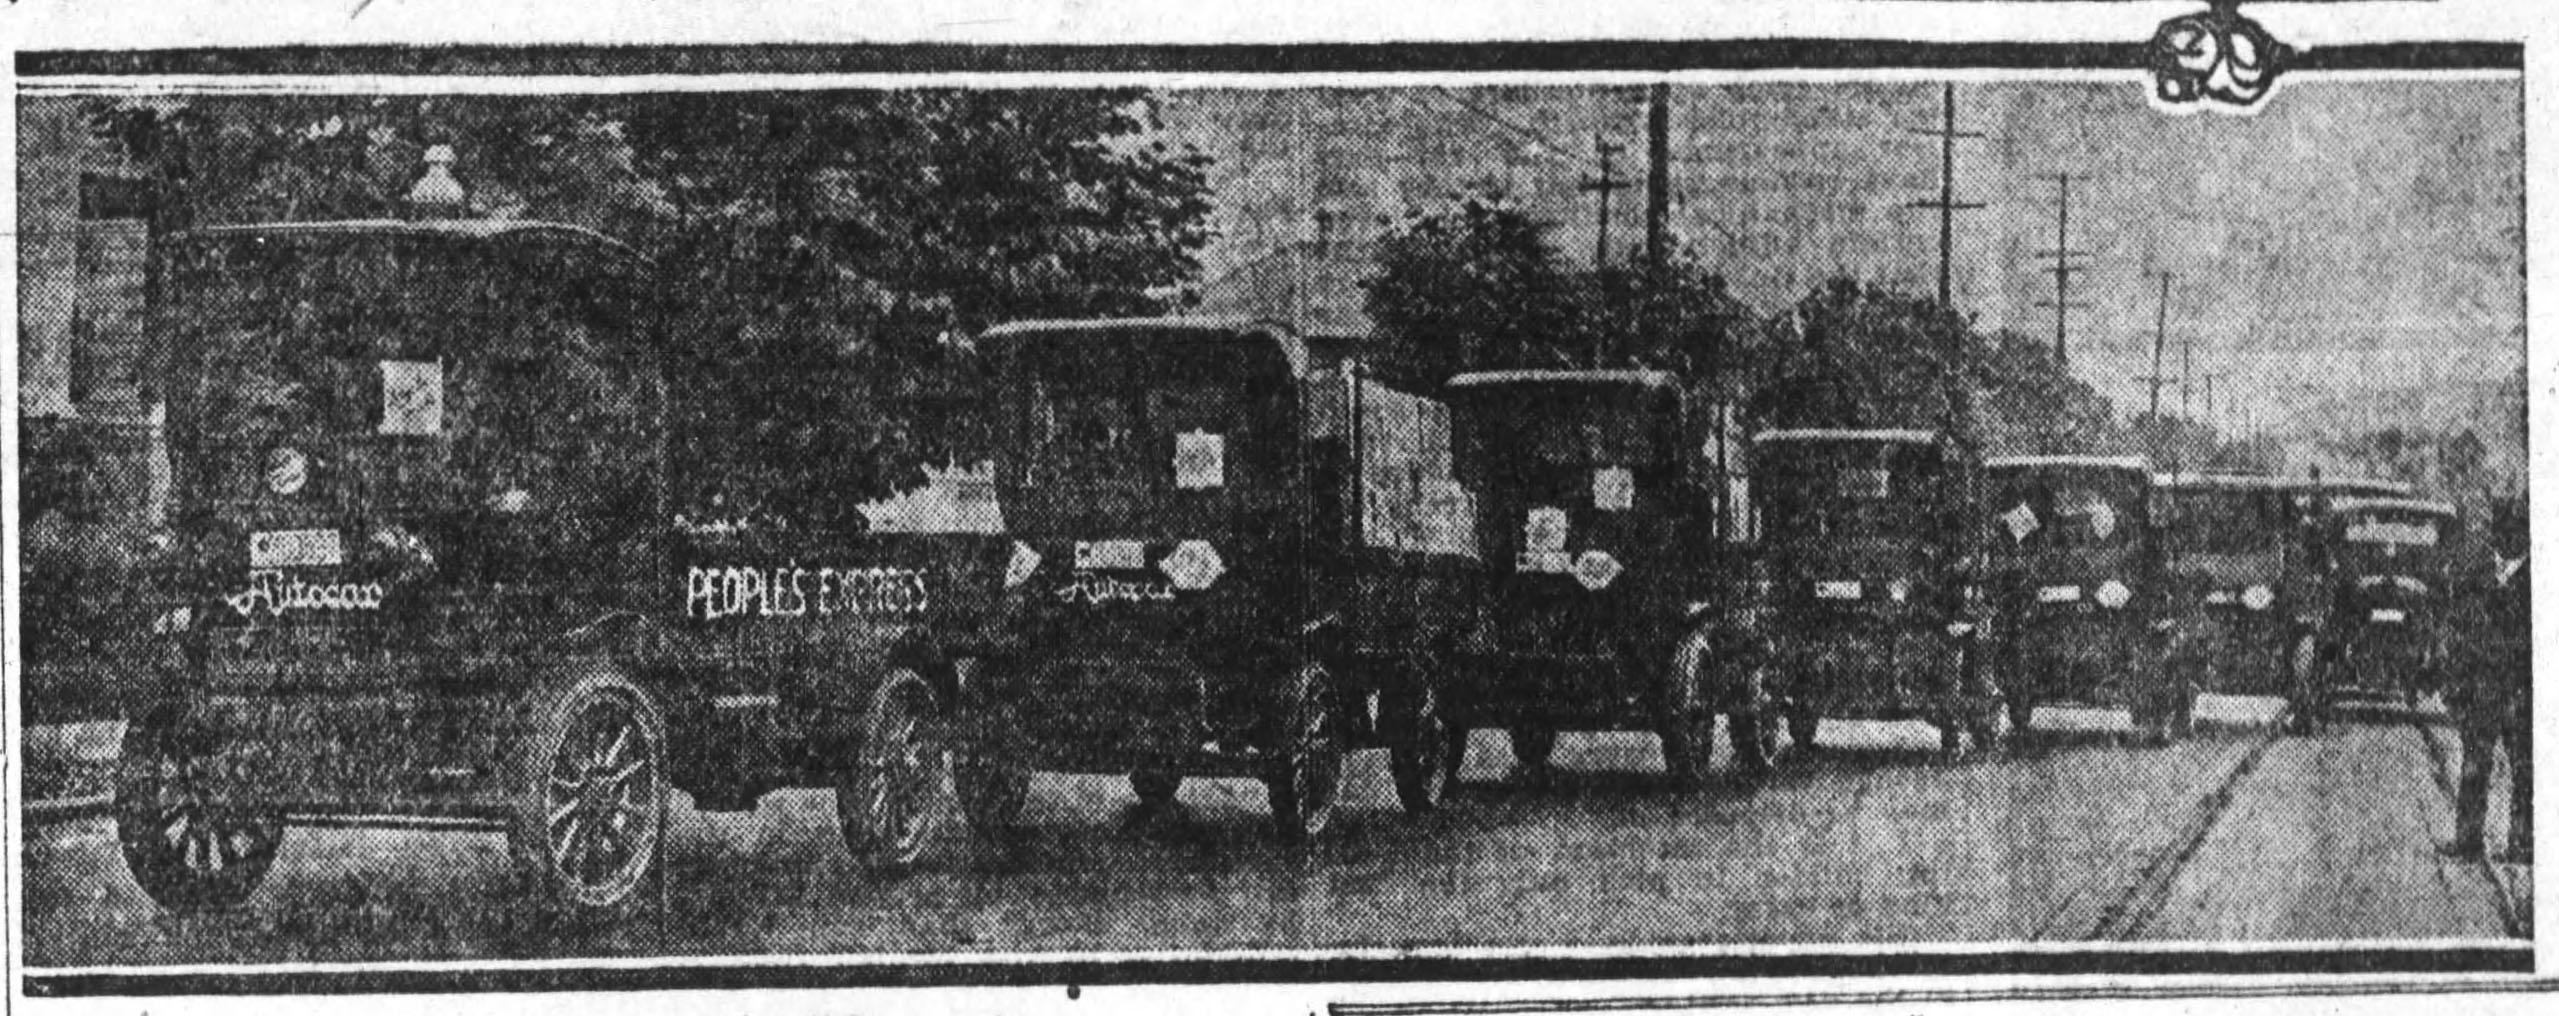 oakland-tribune-sun-oct-5-1919-detail.jpg